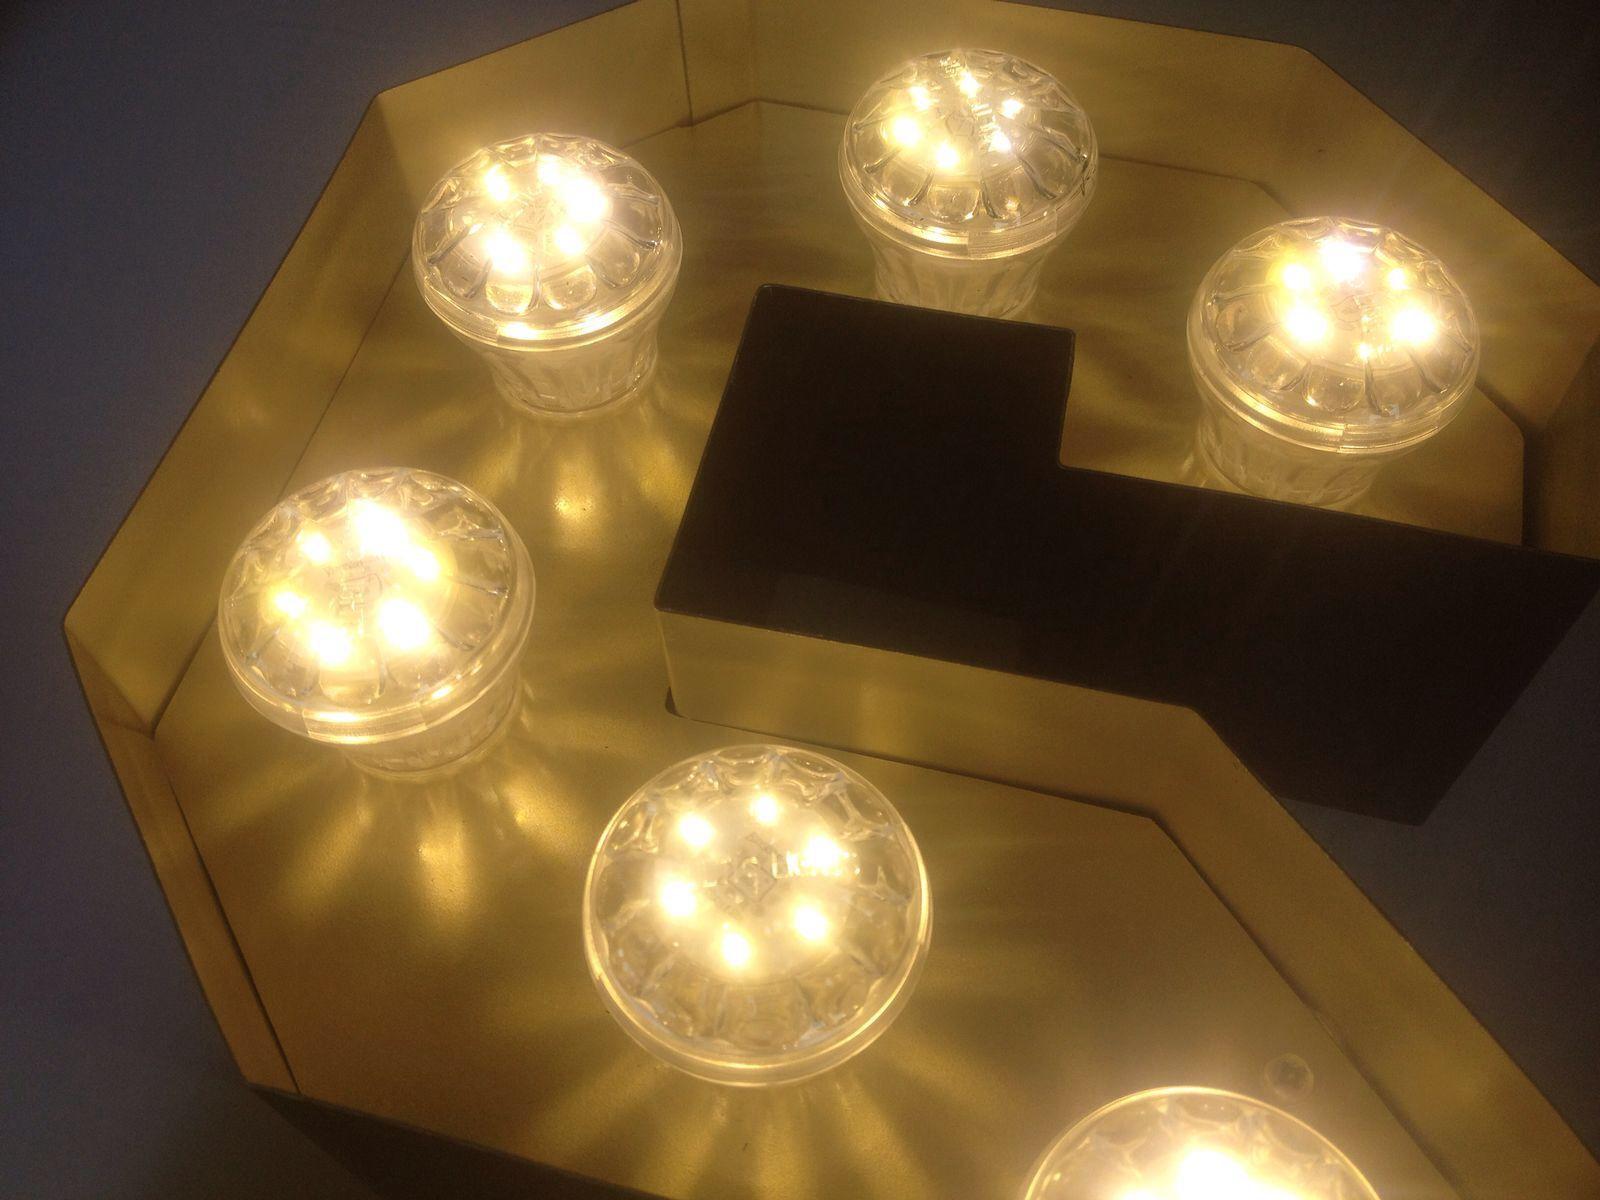 Marquee led letters met kermis lampen | LEDletters - letters met led ...